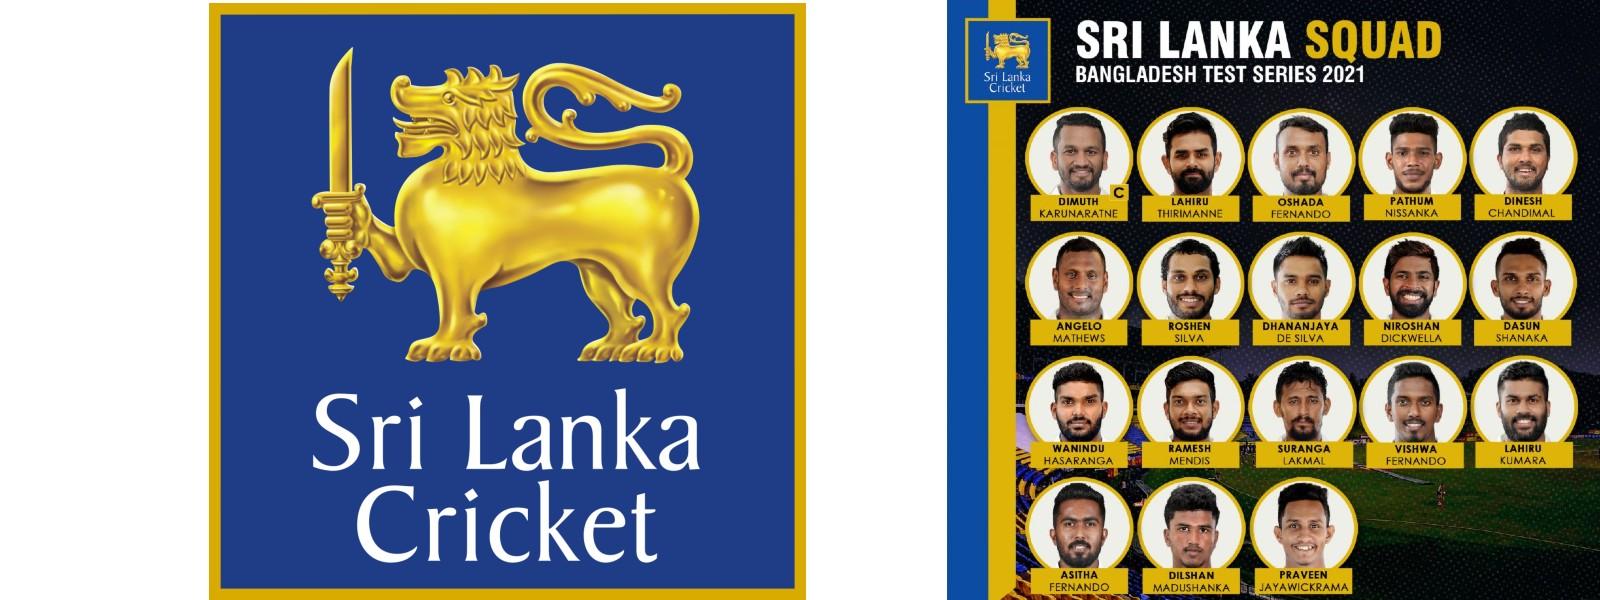 SLC announced squad for Bangladesh Test Series